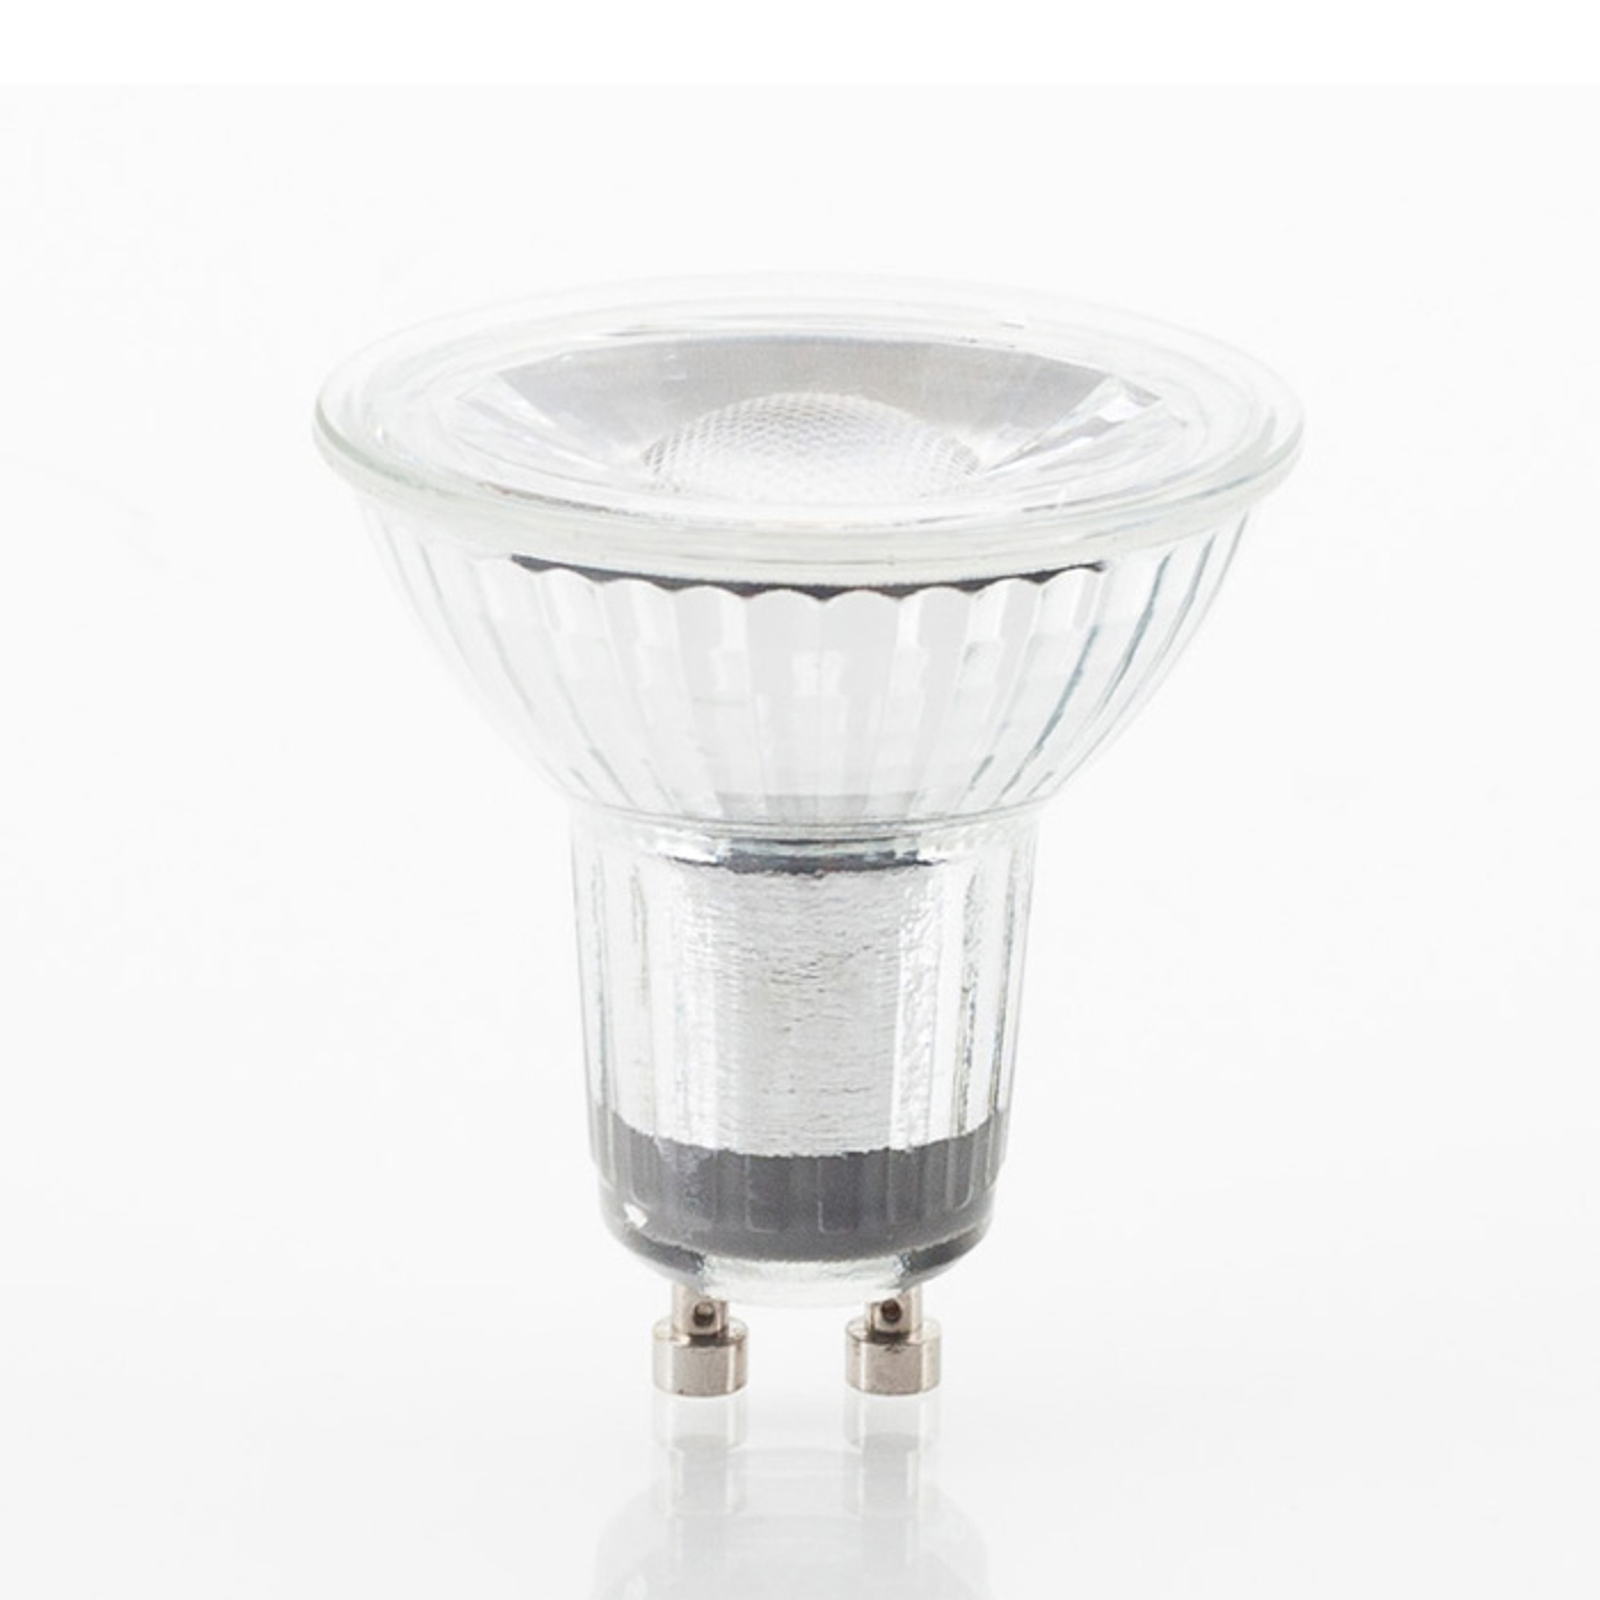 GU10 5W 830 LED-reflectorlamp, dimbaar